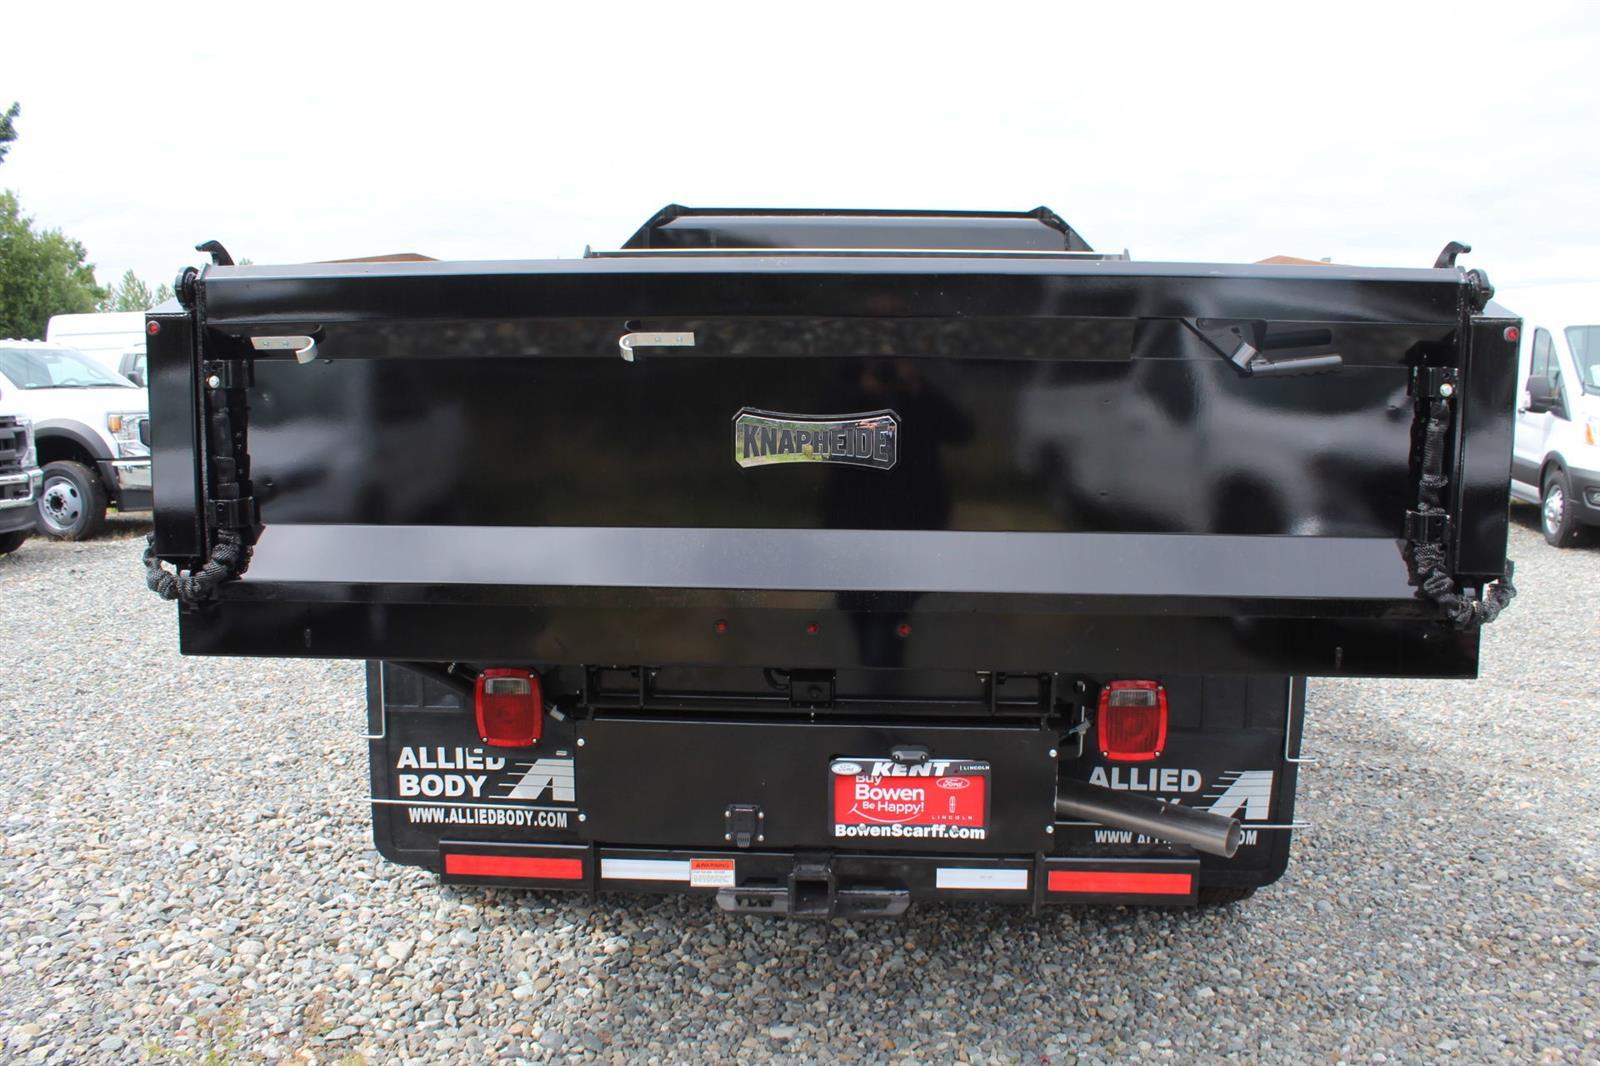 2020 Ford F-550 Regular Cab DRW 4x4, Knapheide Rigid Side Dump Body #E9514 - photo 7